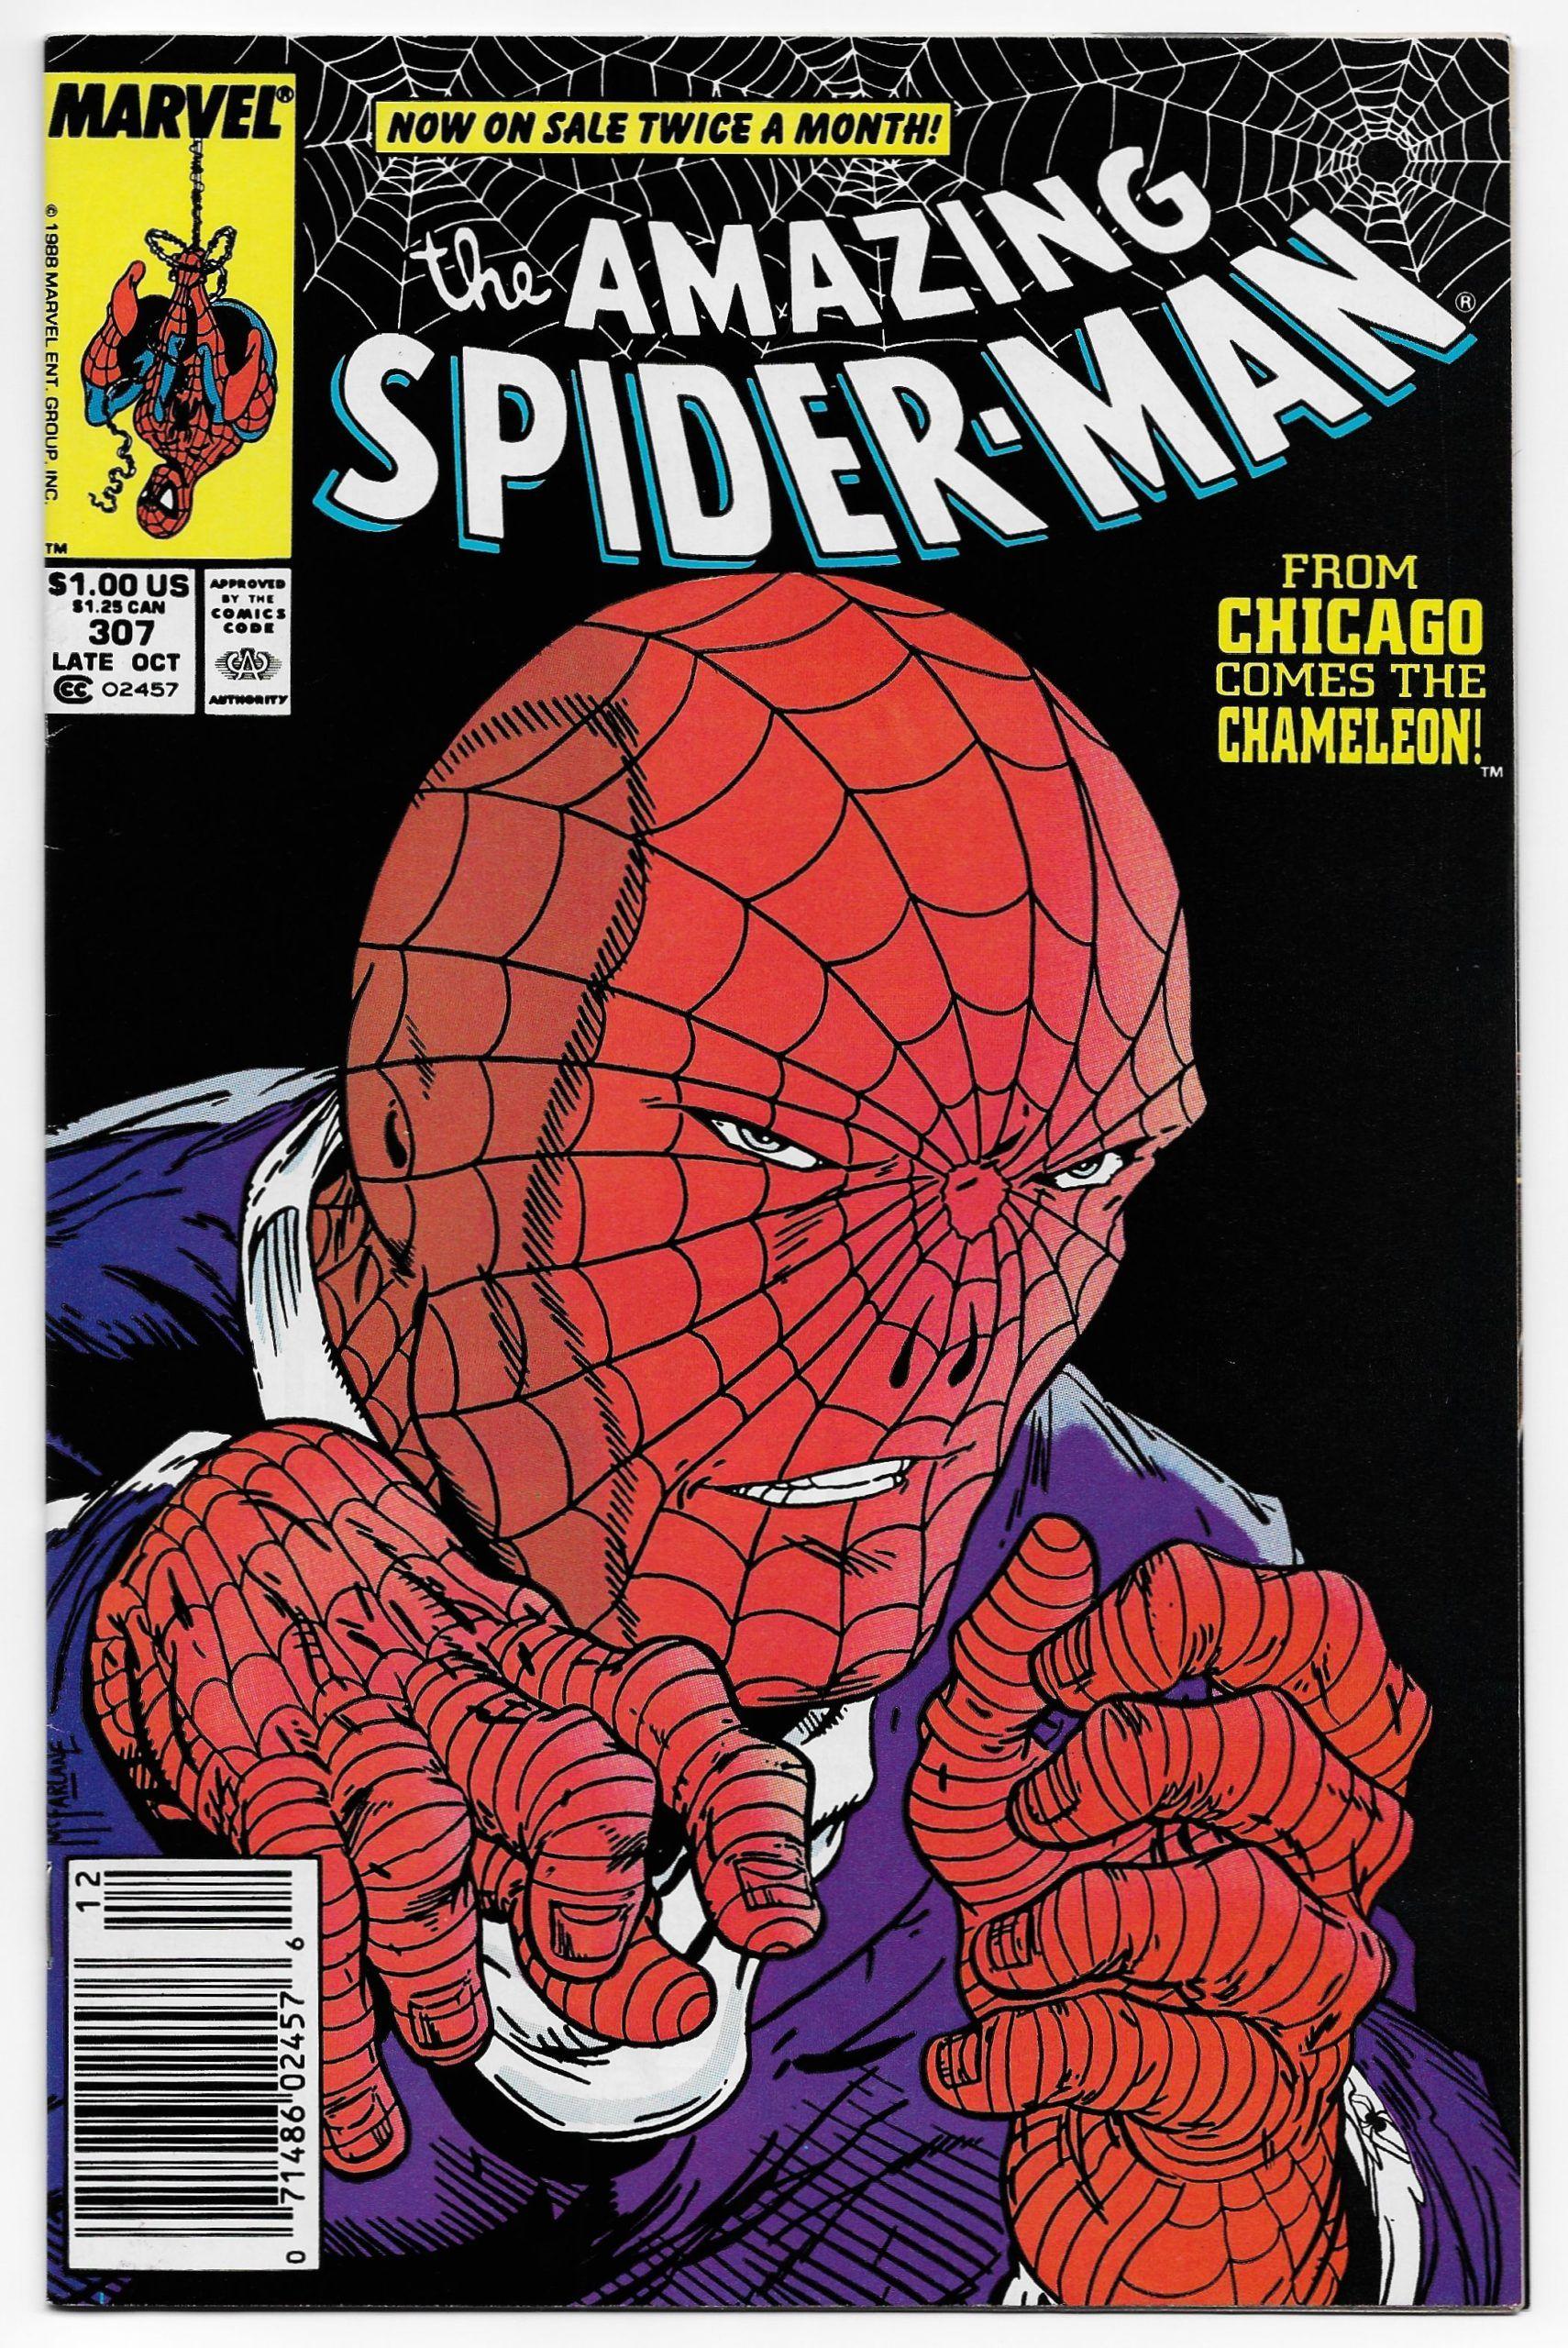 Amazing Spider Man 307 Todd Mcfarlane Art Marvel 1988 Vf Nm Spiderman Amazing Spider Todd Mcfarlane